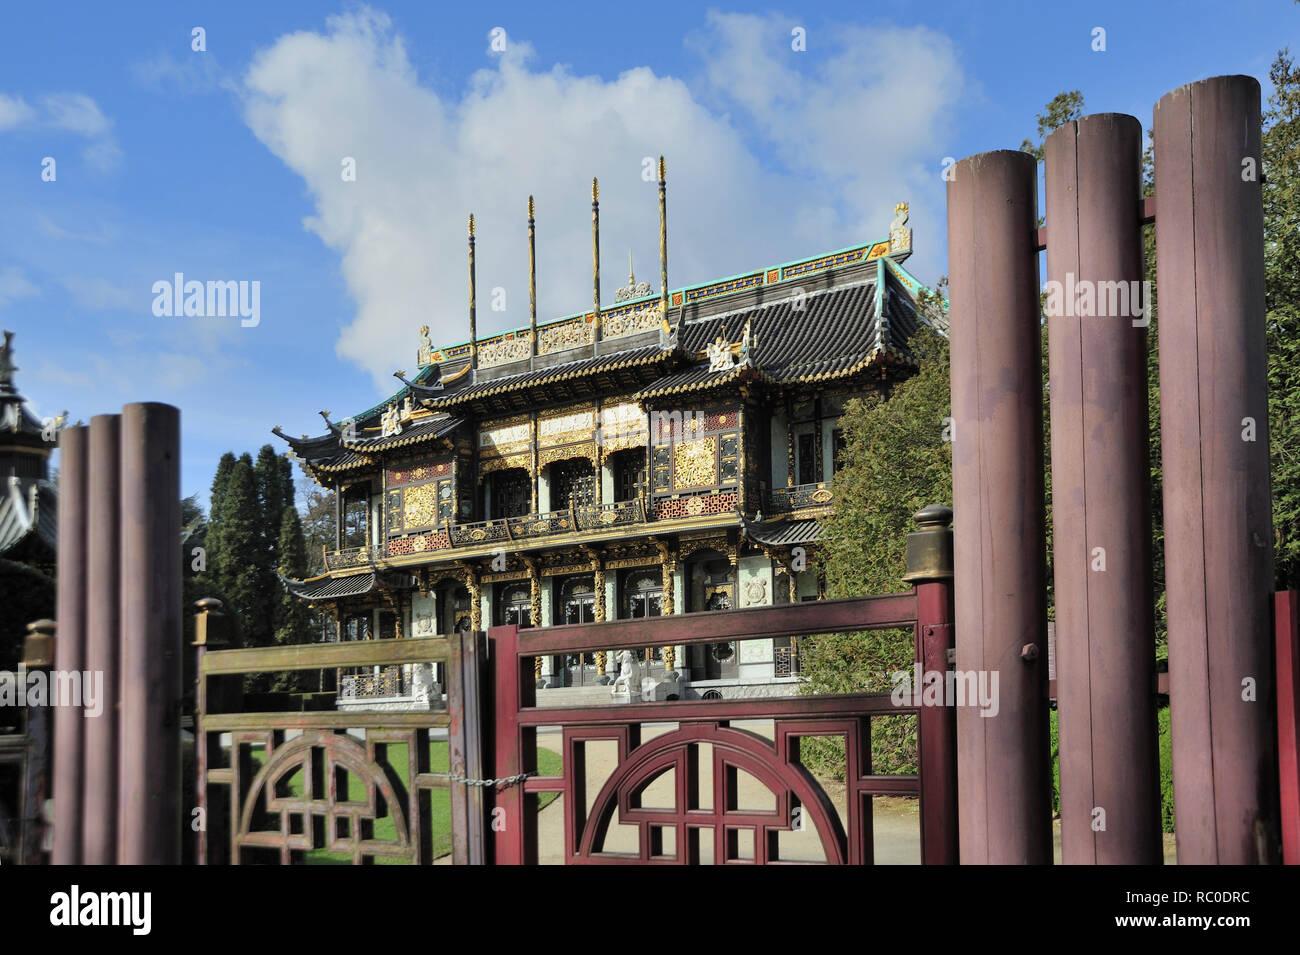 Chinesischer Pavillon, Laken,  Brüssel, Belgien, Europa | Chinese Pavilion, Laeken, Brussels, Europe - Stock Image